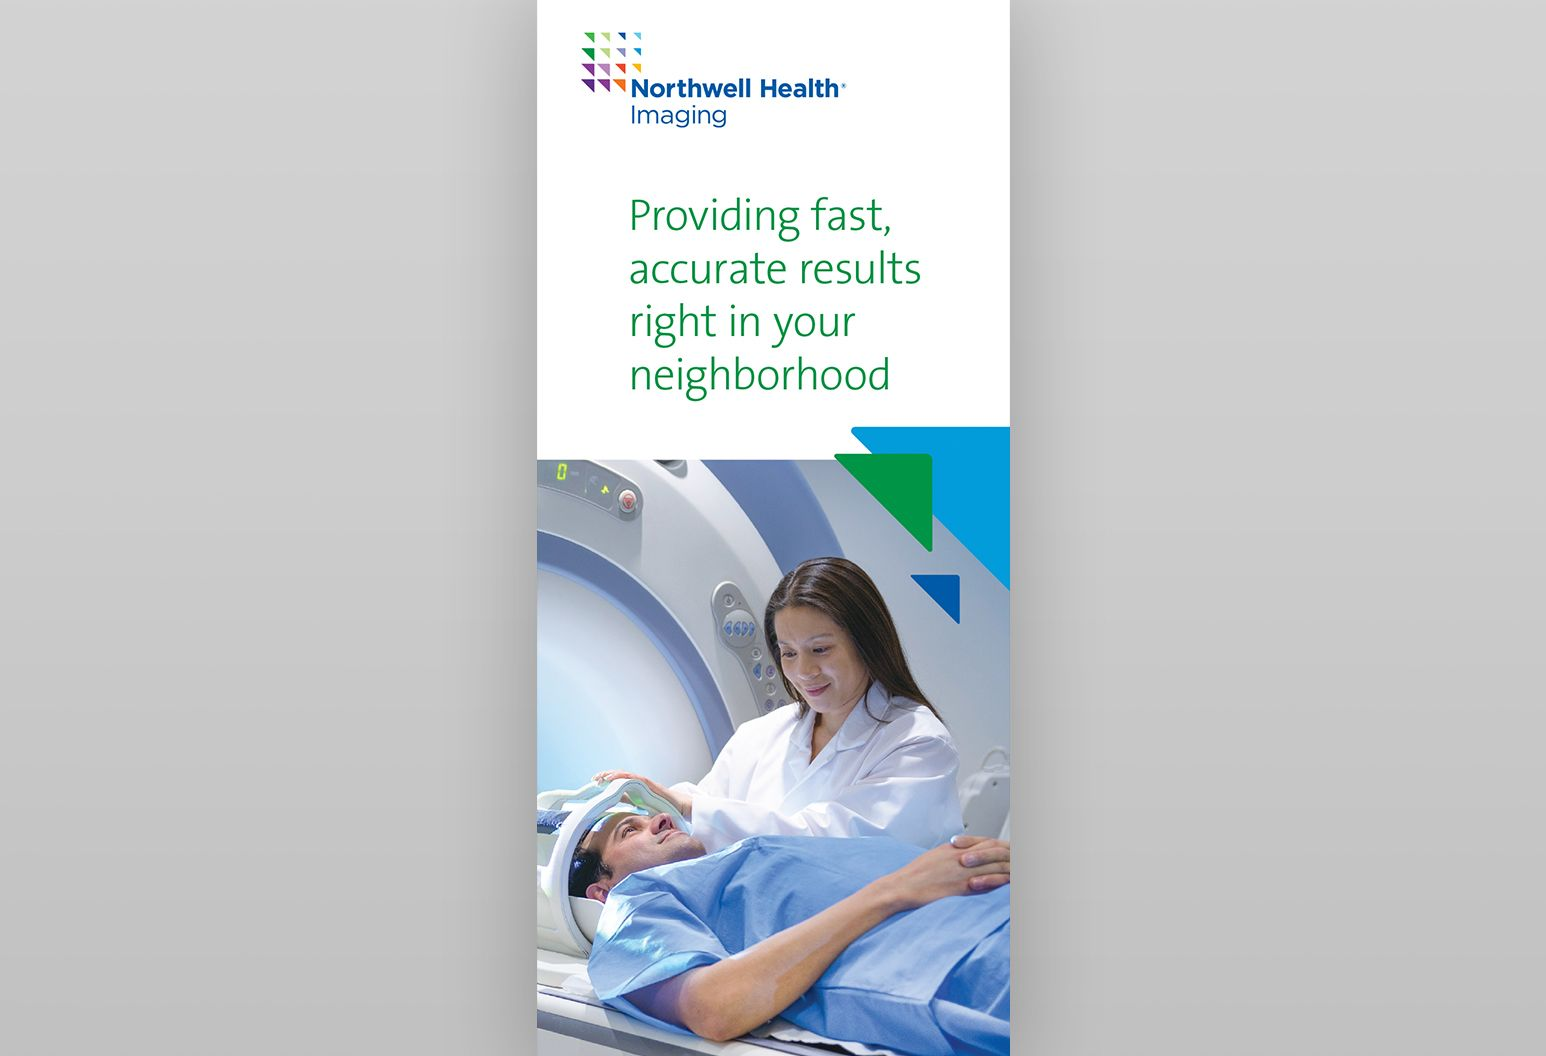 Ultrasound (sonogram) - Imaging | Northwell Health